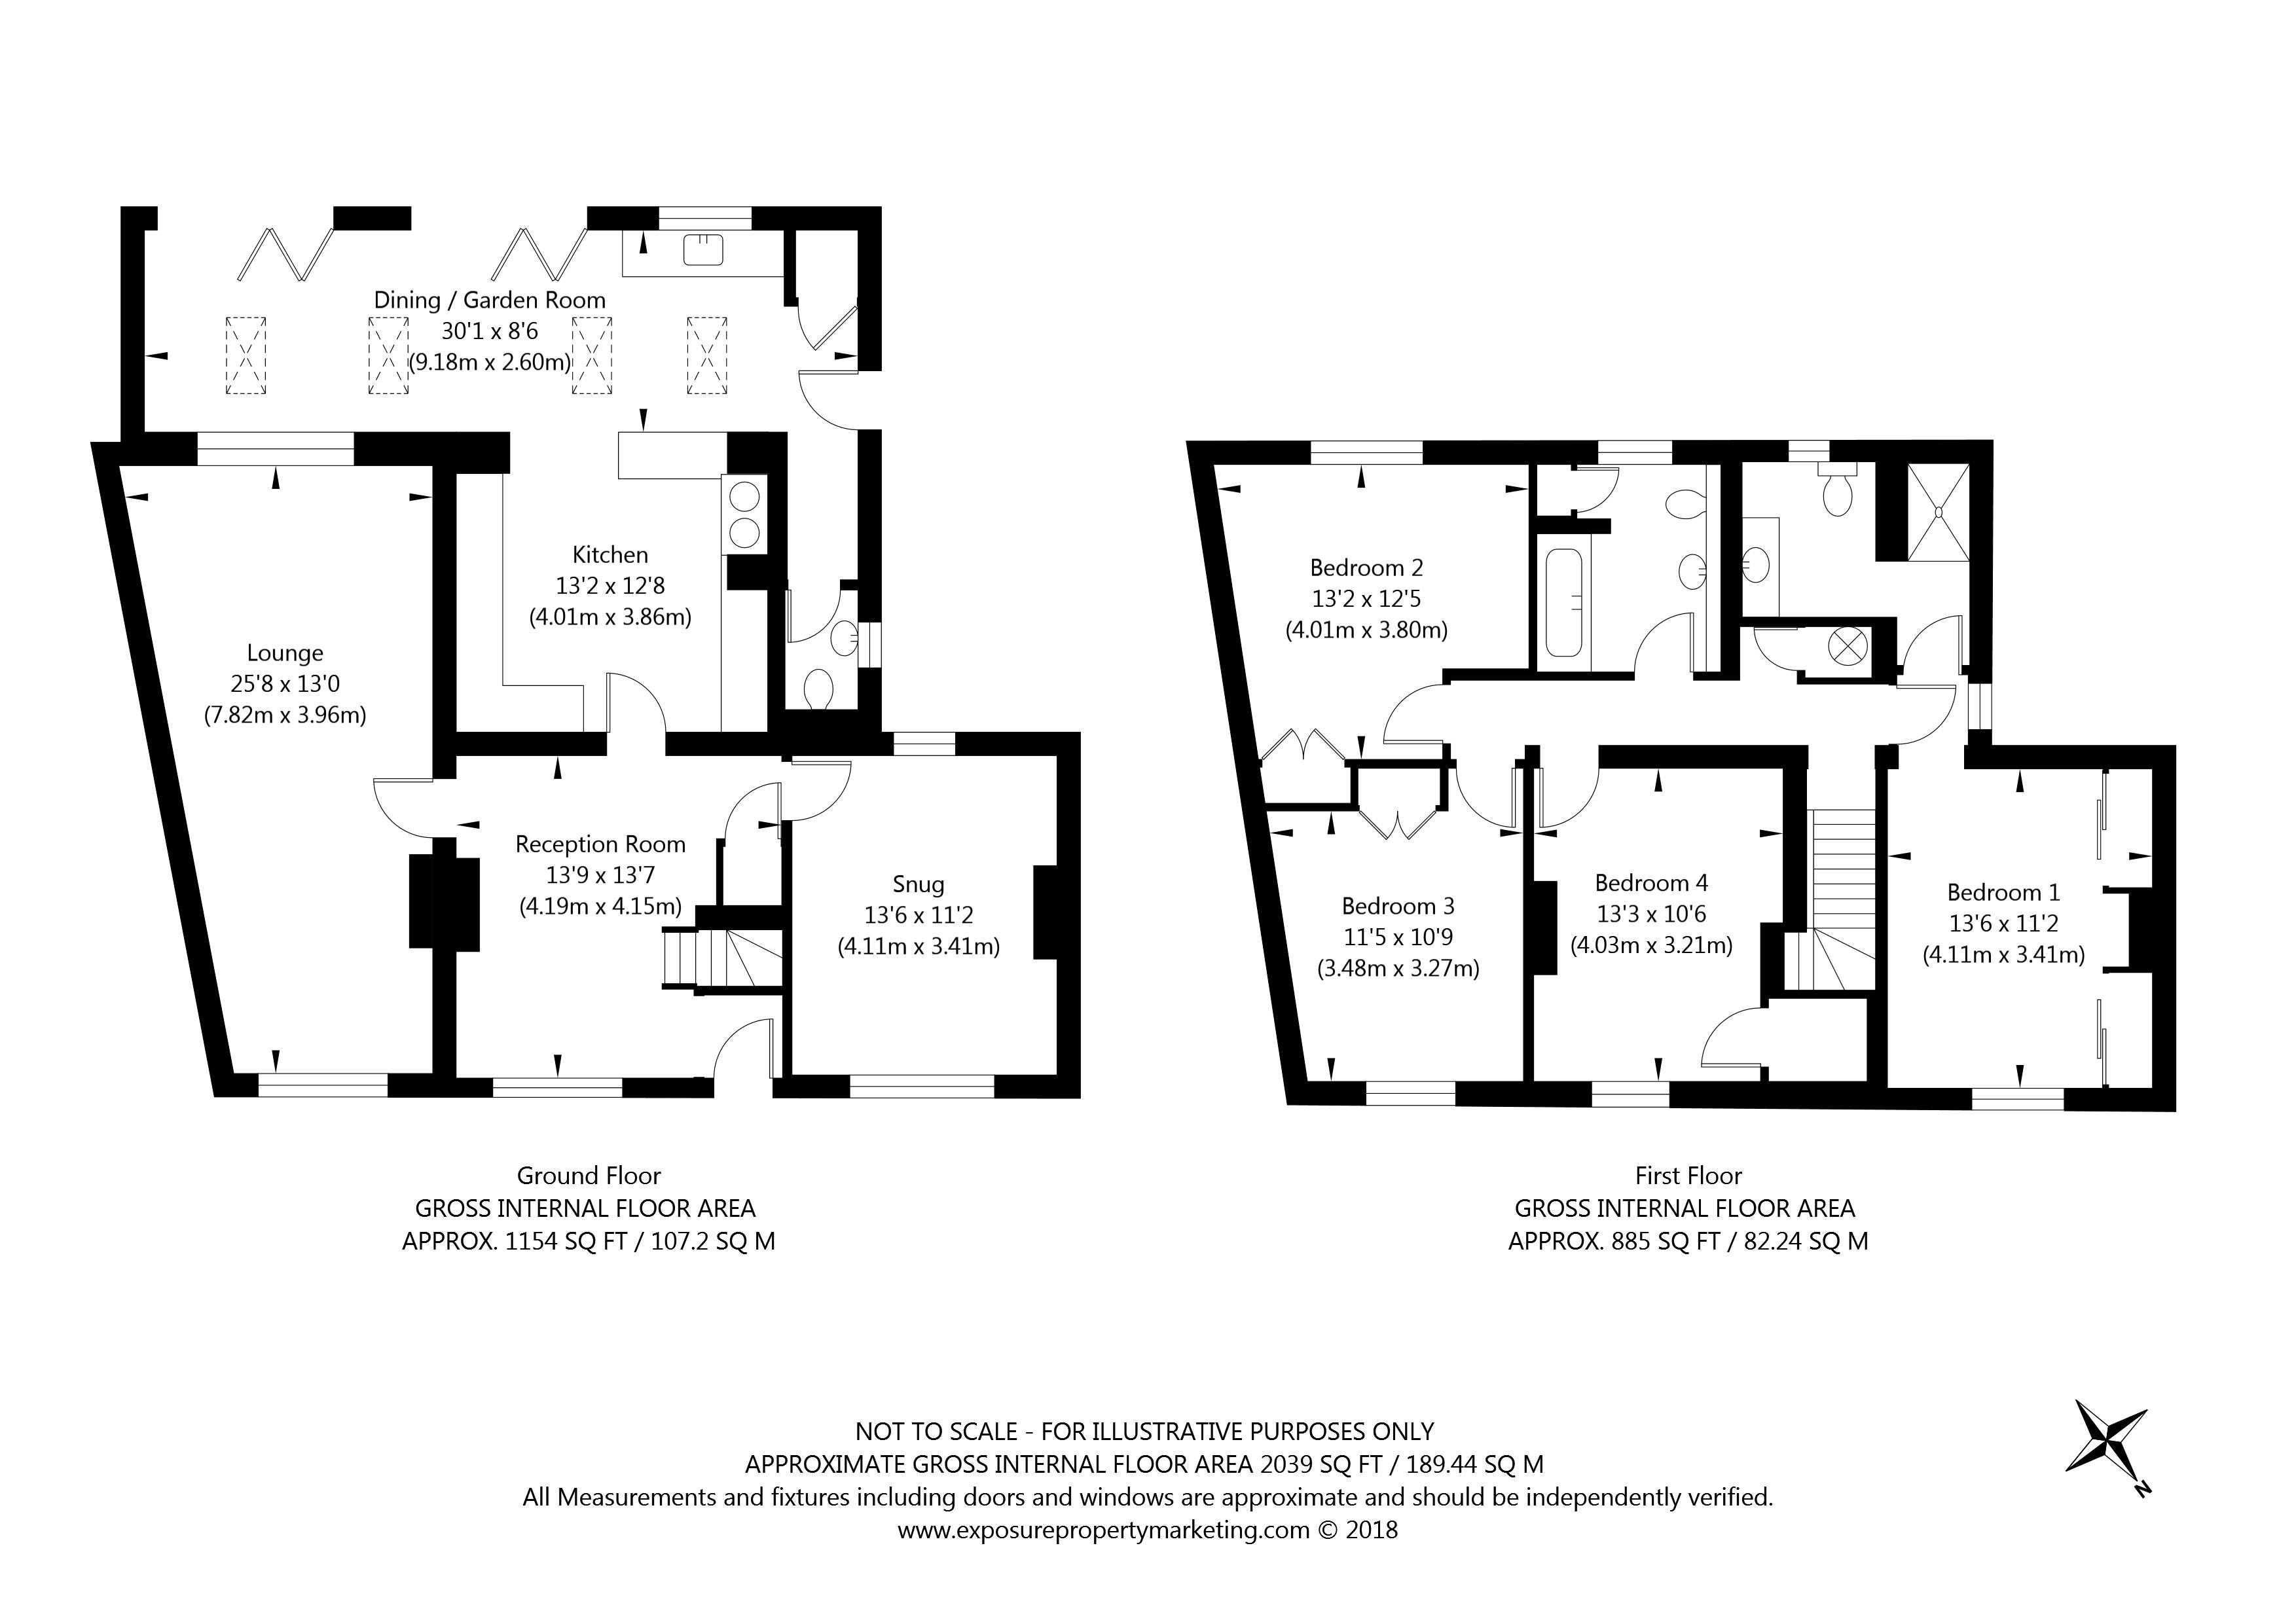 26 Church Street, Dunnington, York property floorplan